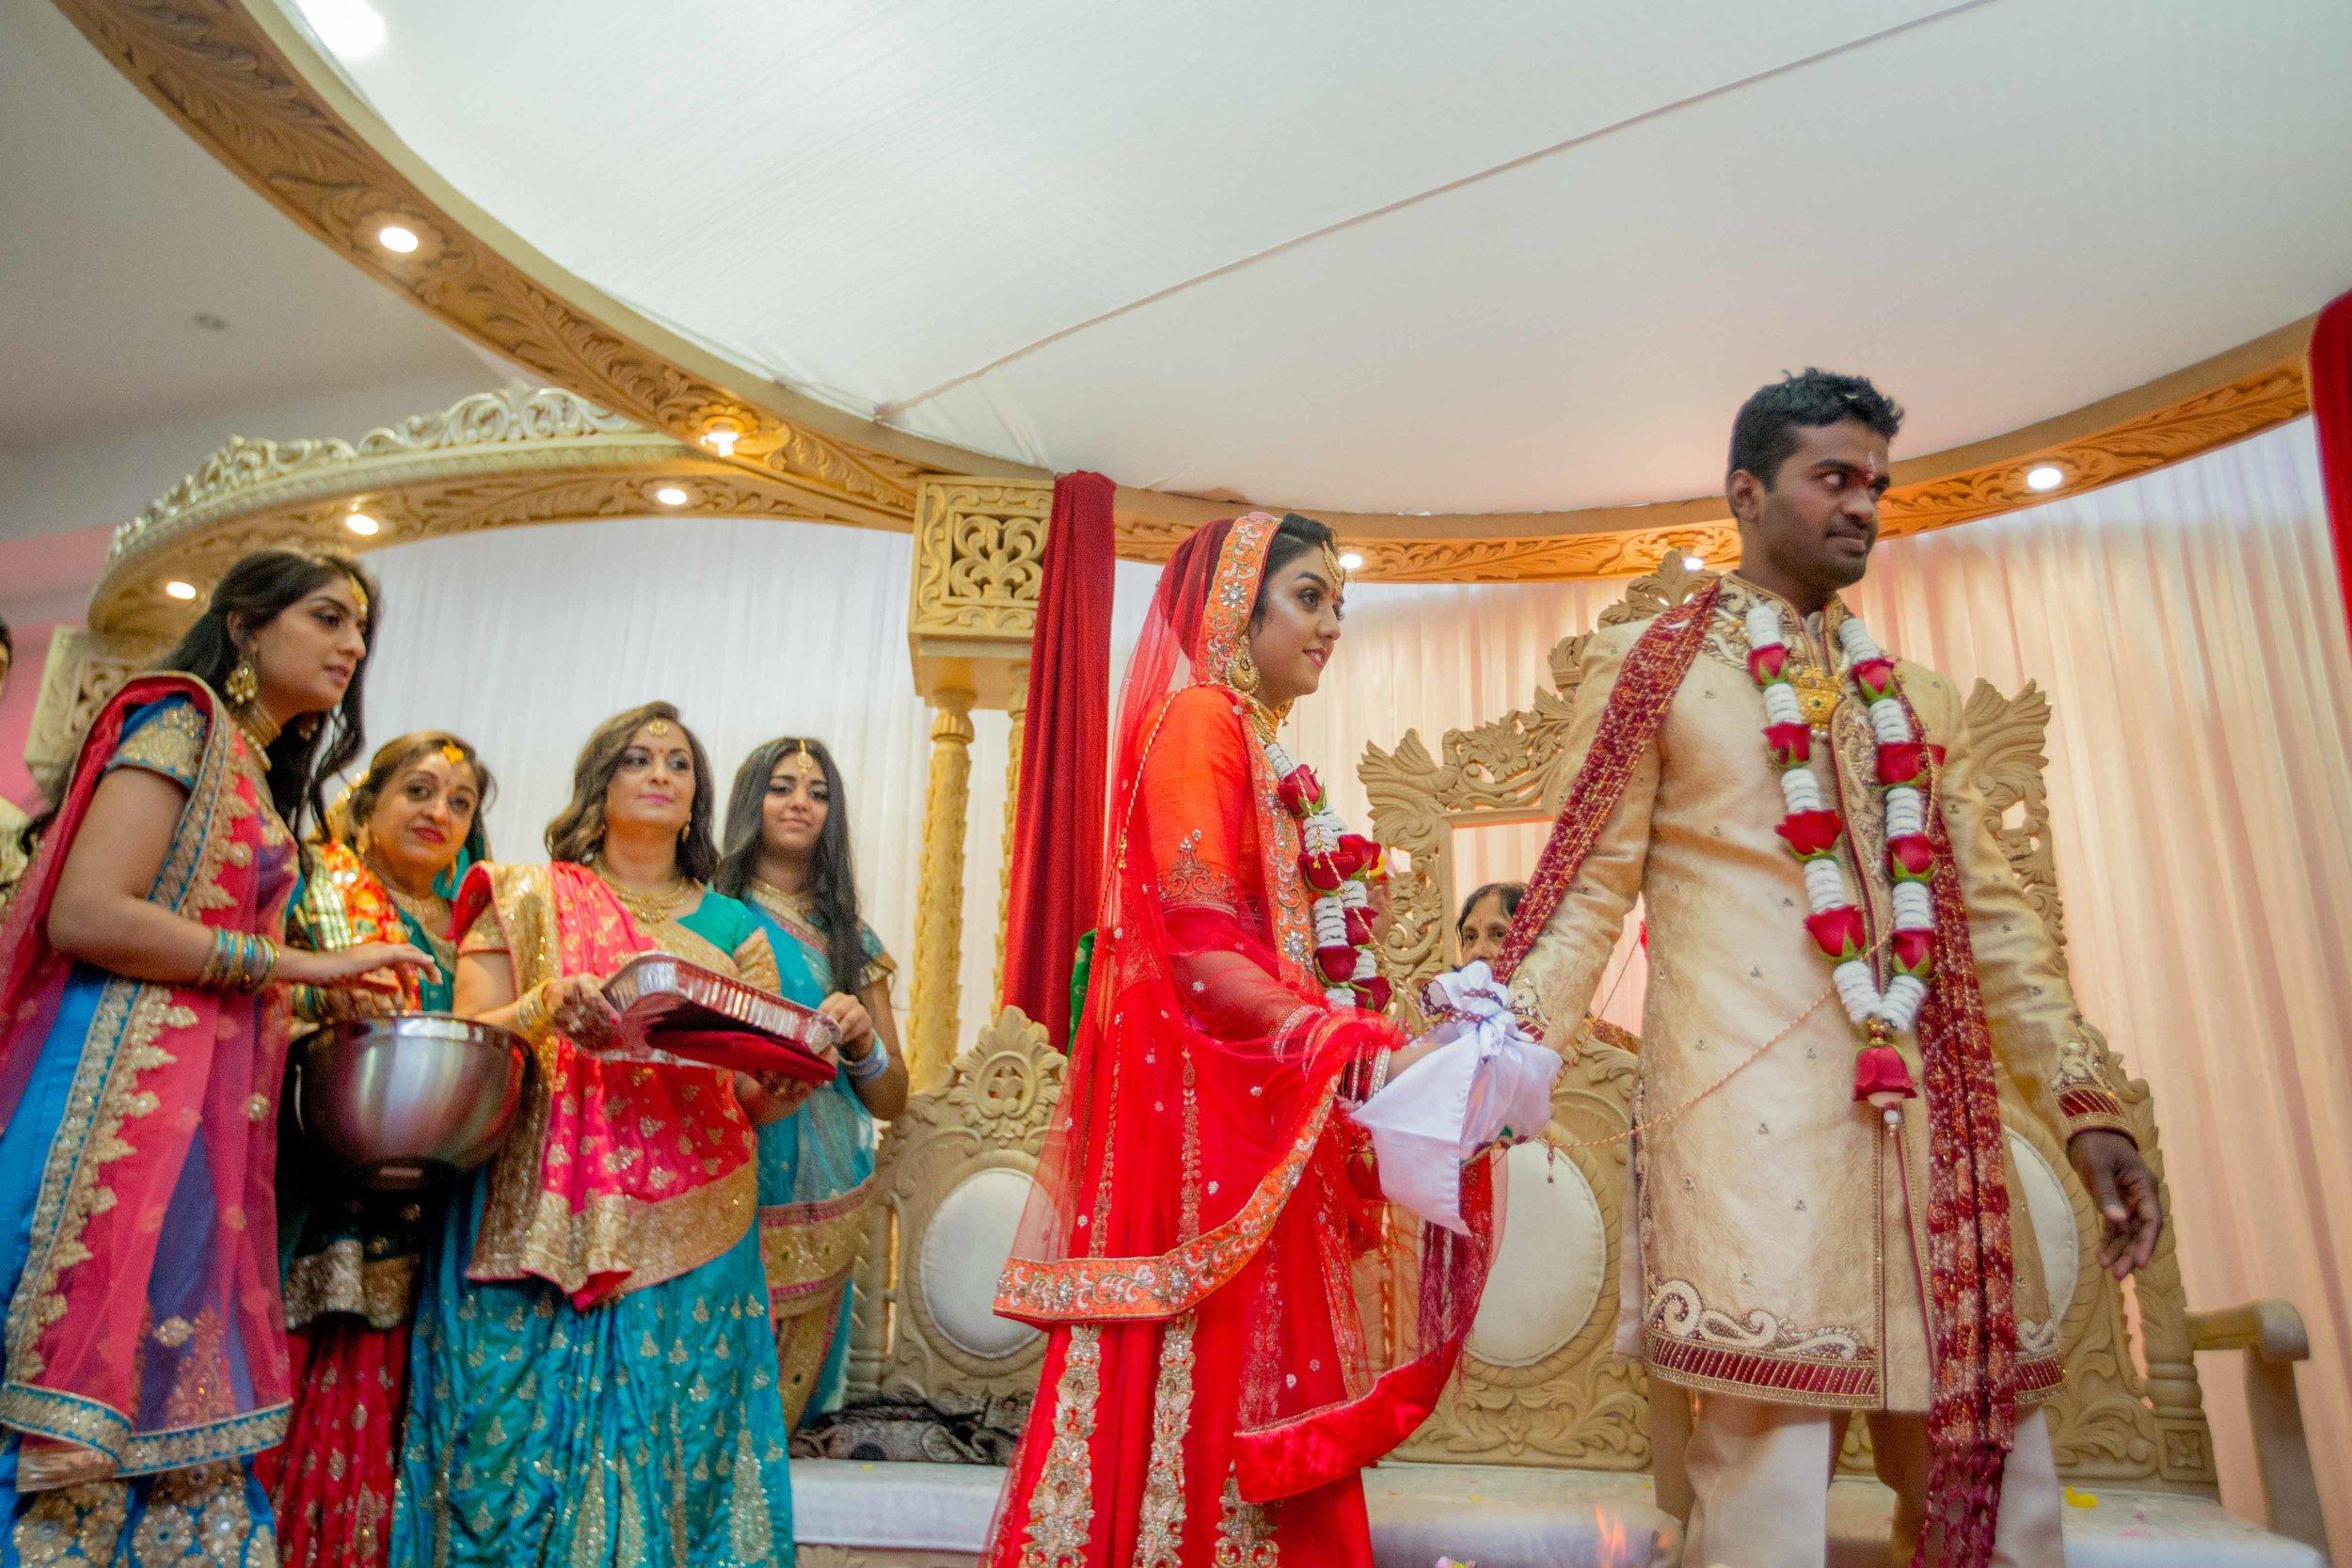 premier-banquetting-london-Hindu-asian-wedding-photographer-natalia-smith-photography-26.jpg